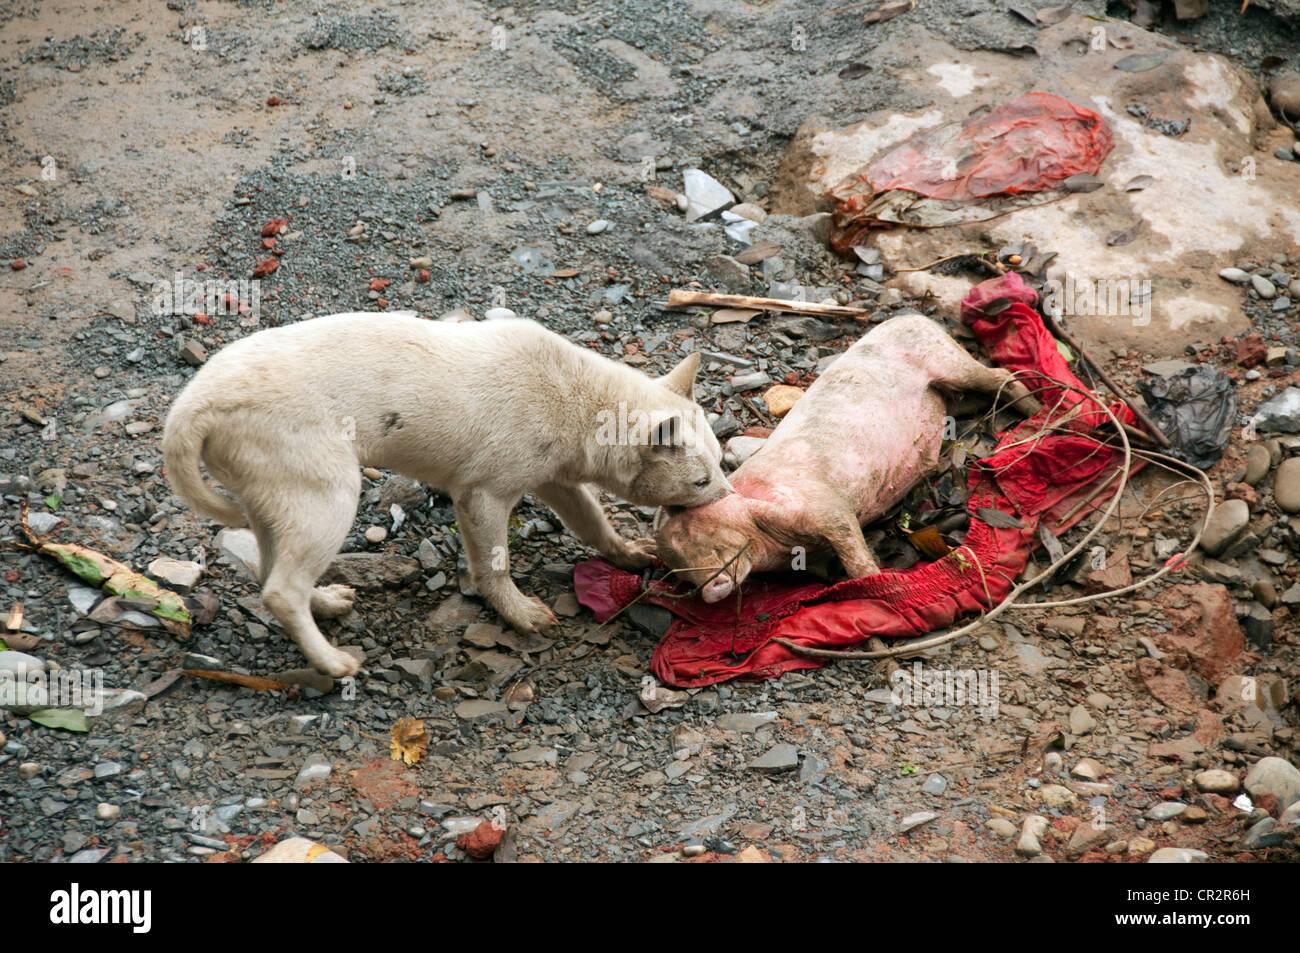 Small Pig Dog Breeds